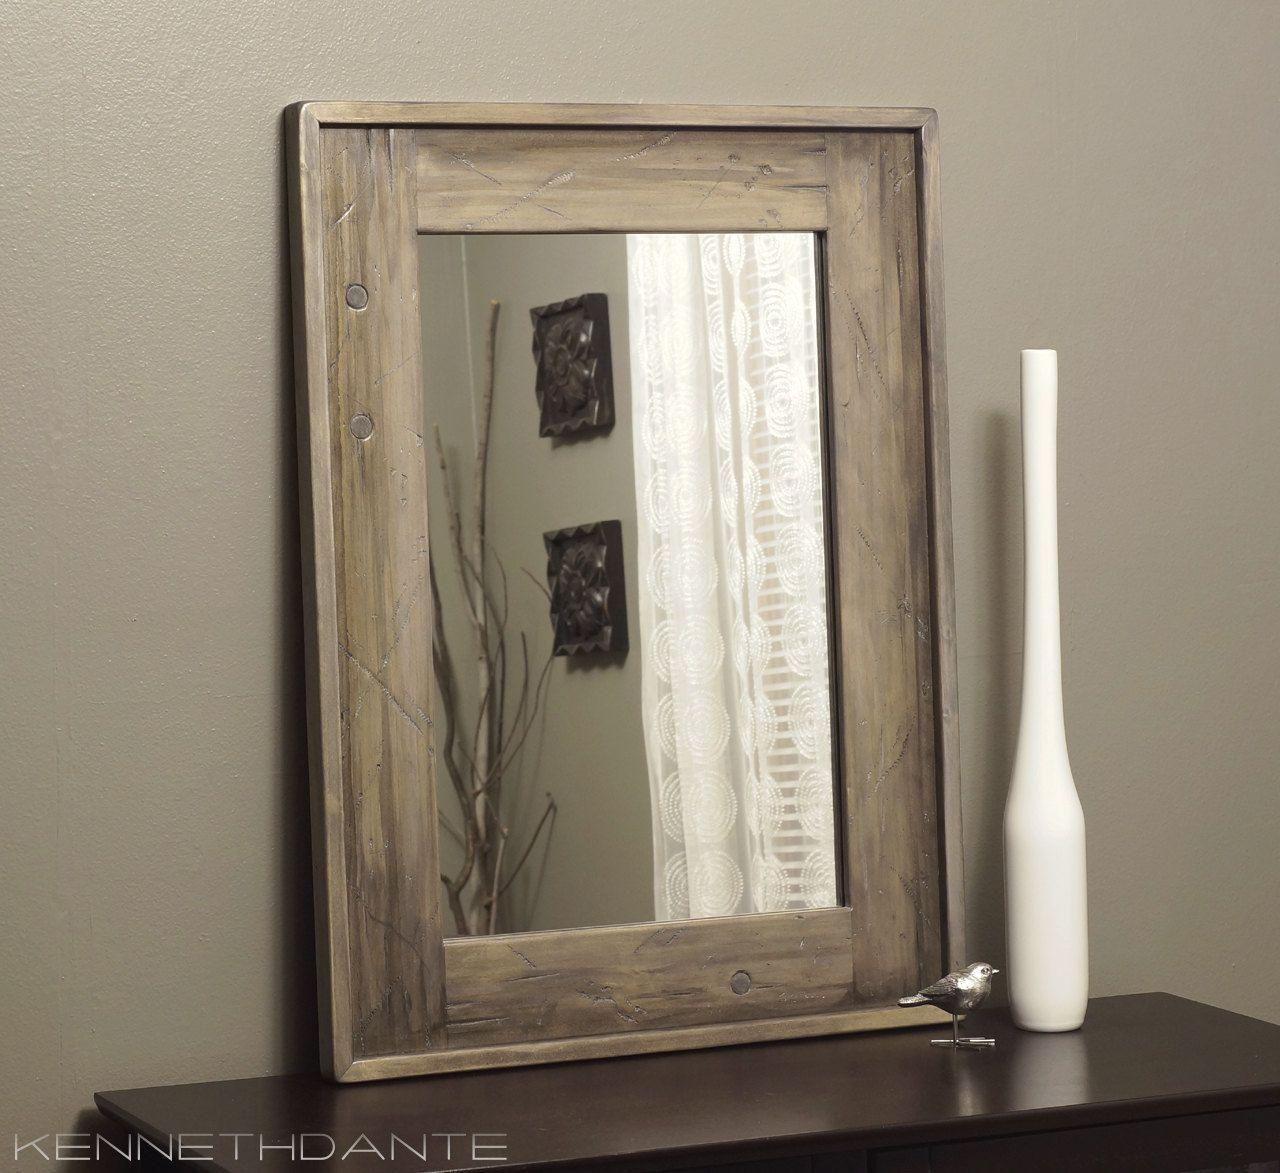 Bathroom Mirror Wood Distressed Driftwood Weathered Taupe Etsy Wood Mirror Bathroom Distressed Wood Mirror Wood Framed Mirror [ 1173 x 1280 Pixel ]